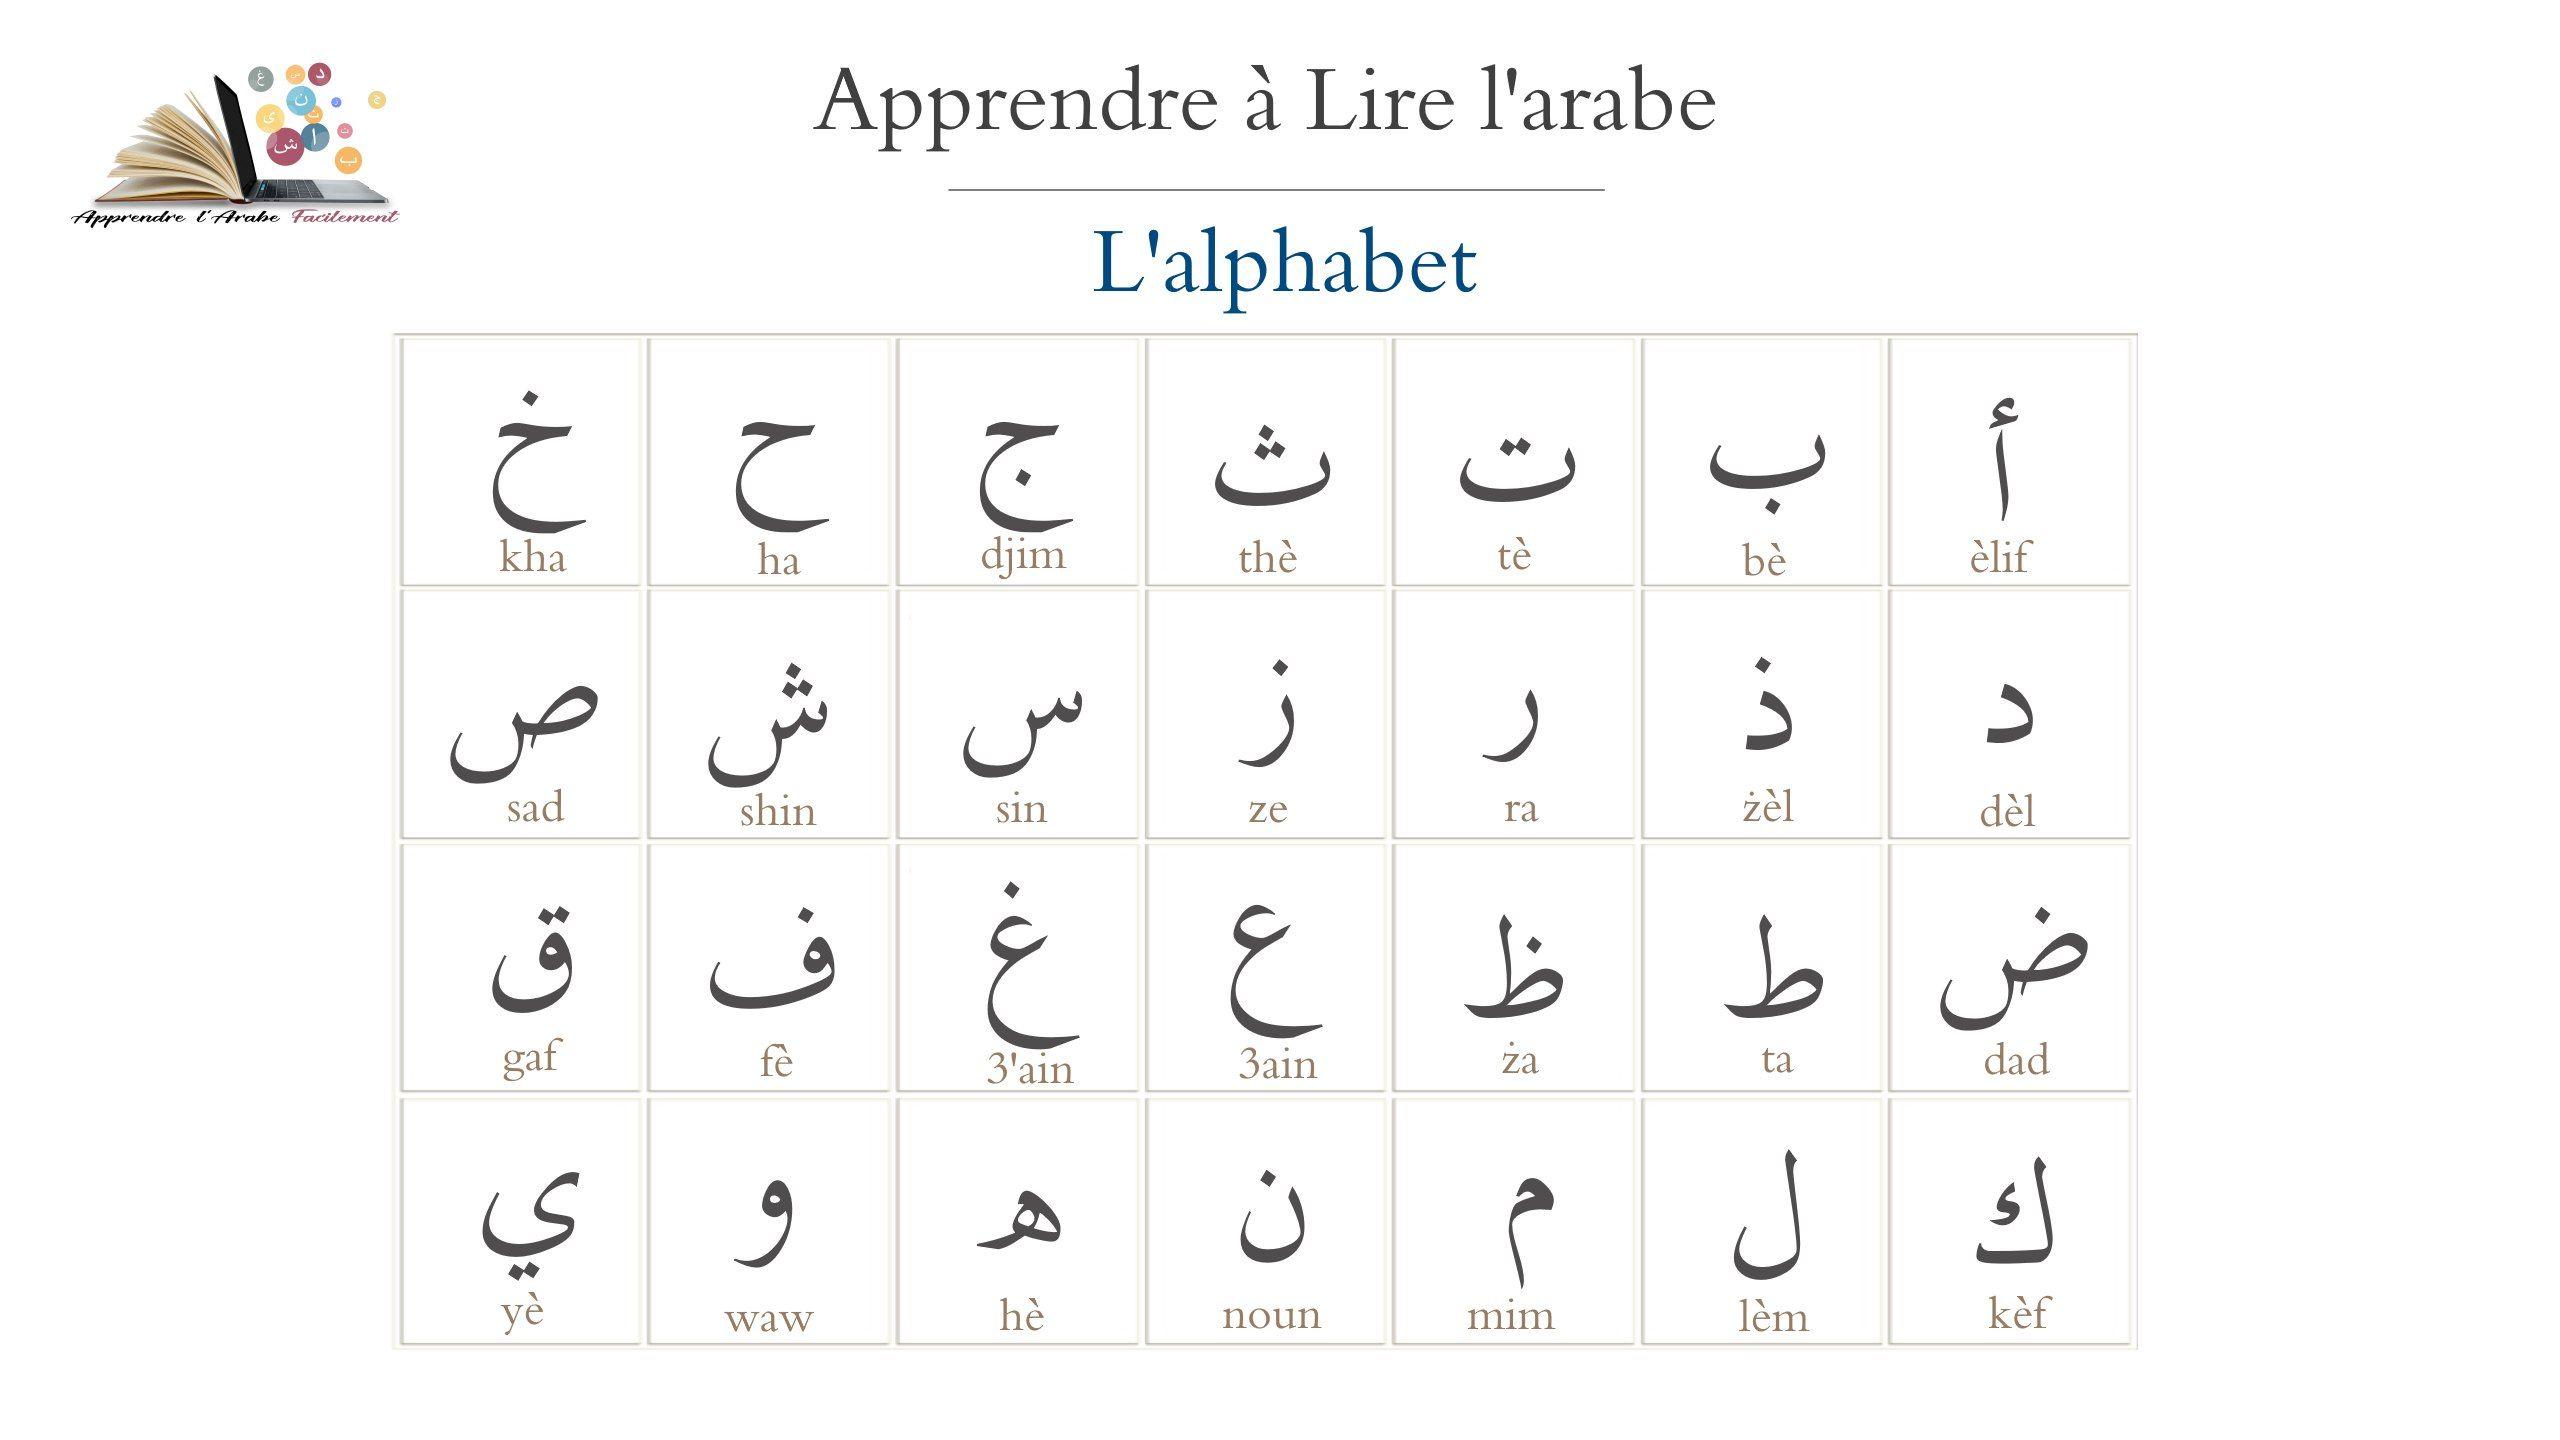 Alphabet Arabe Apprendre L Arabe Apprendre A Lire L Arabe Apprendre A Lire